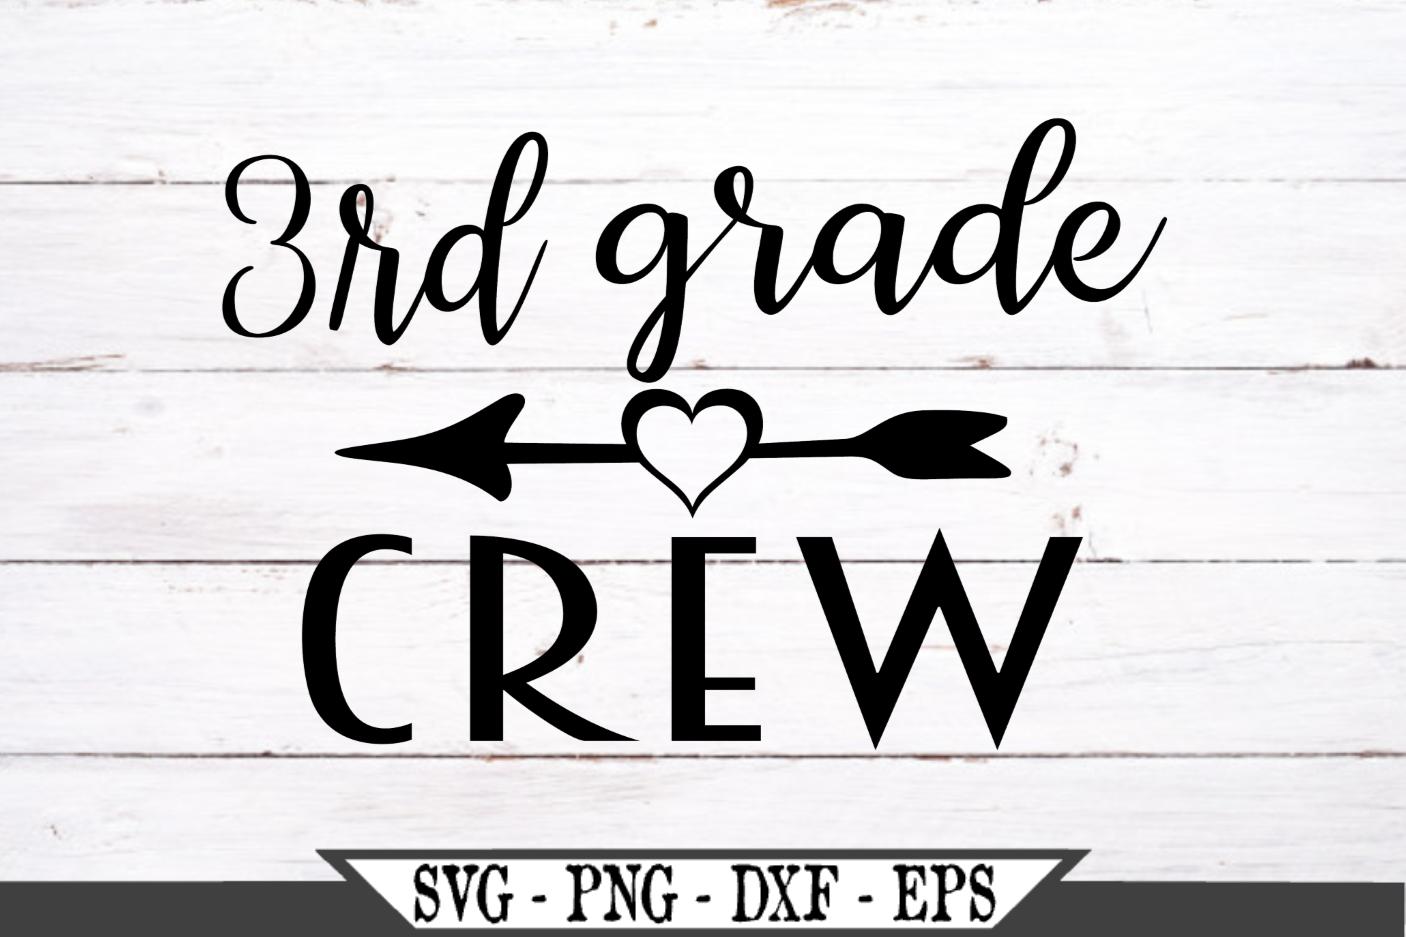 3rd Grade Crew for Third Grader SVG example image 2